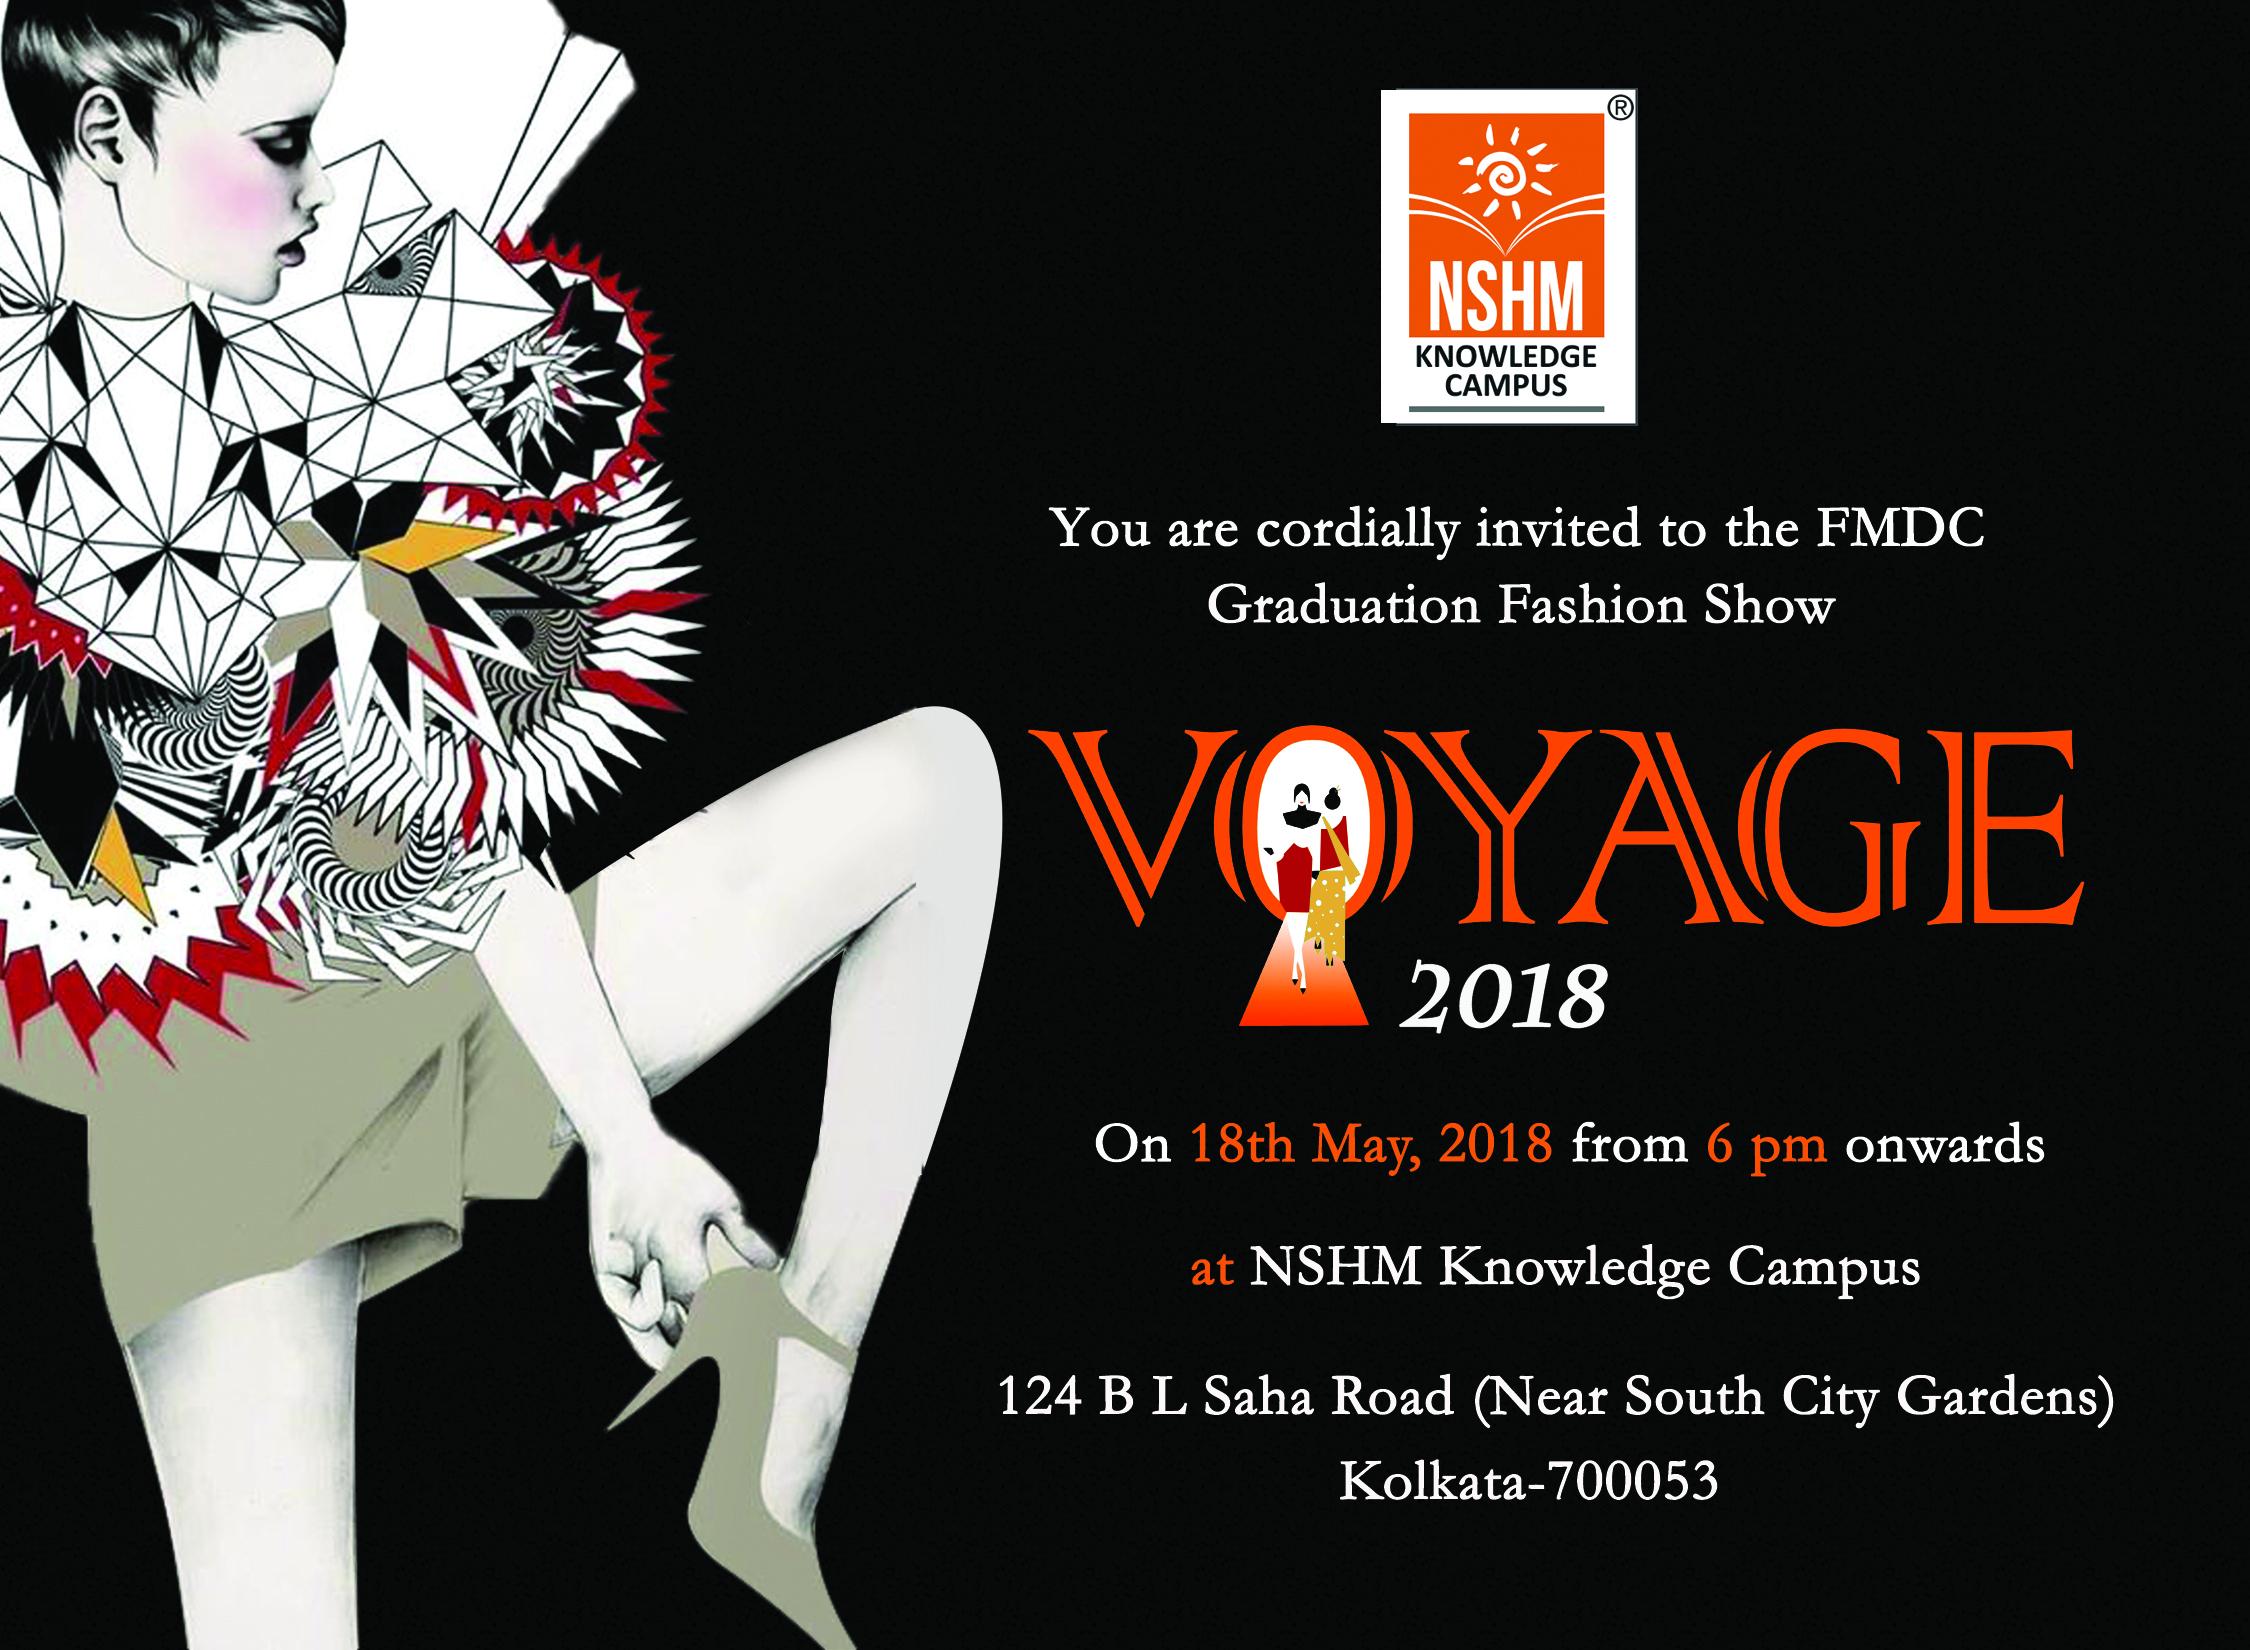 Voyage 2018 Nshm Knowledge Campus